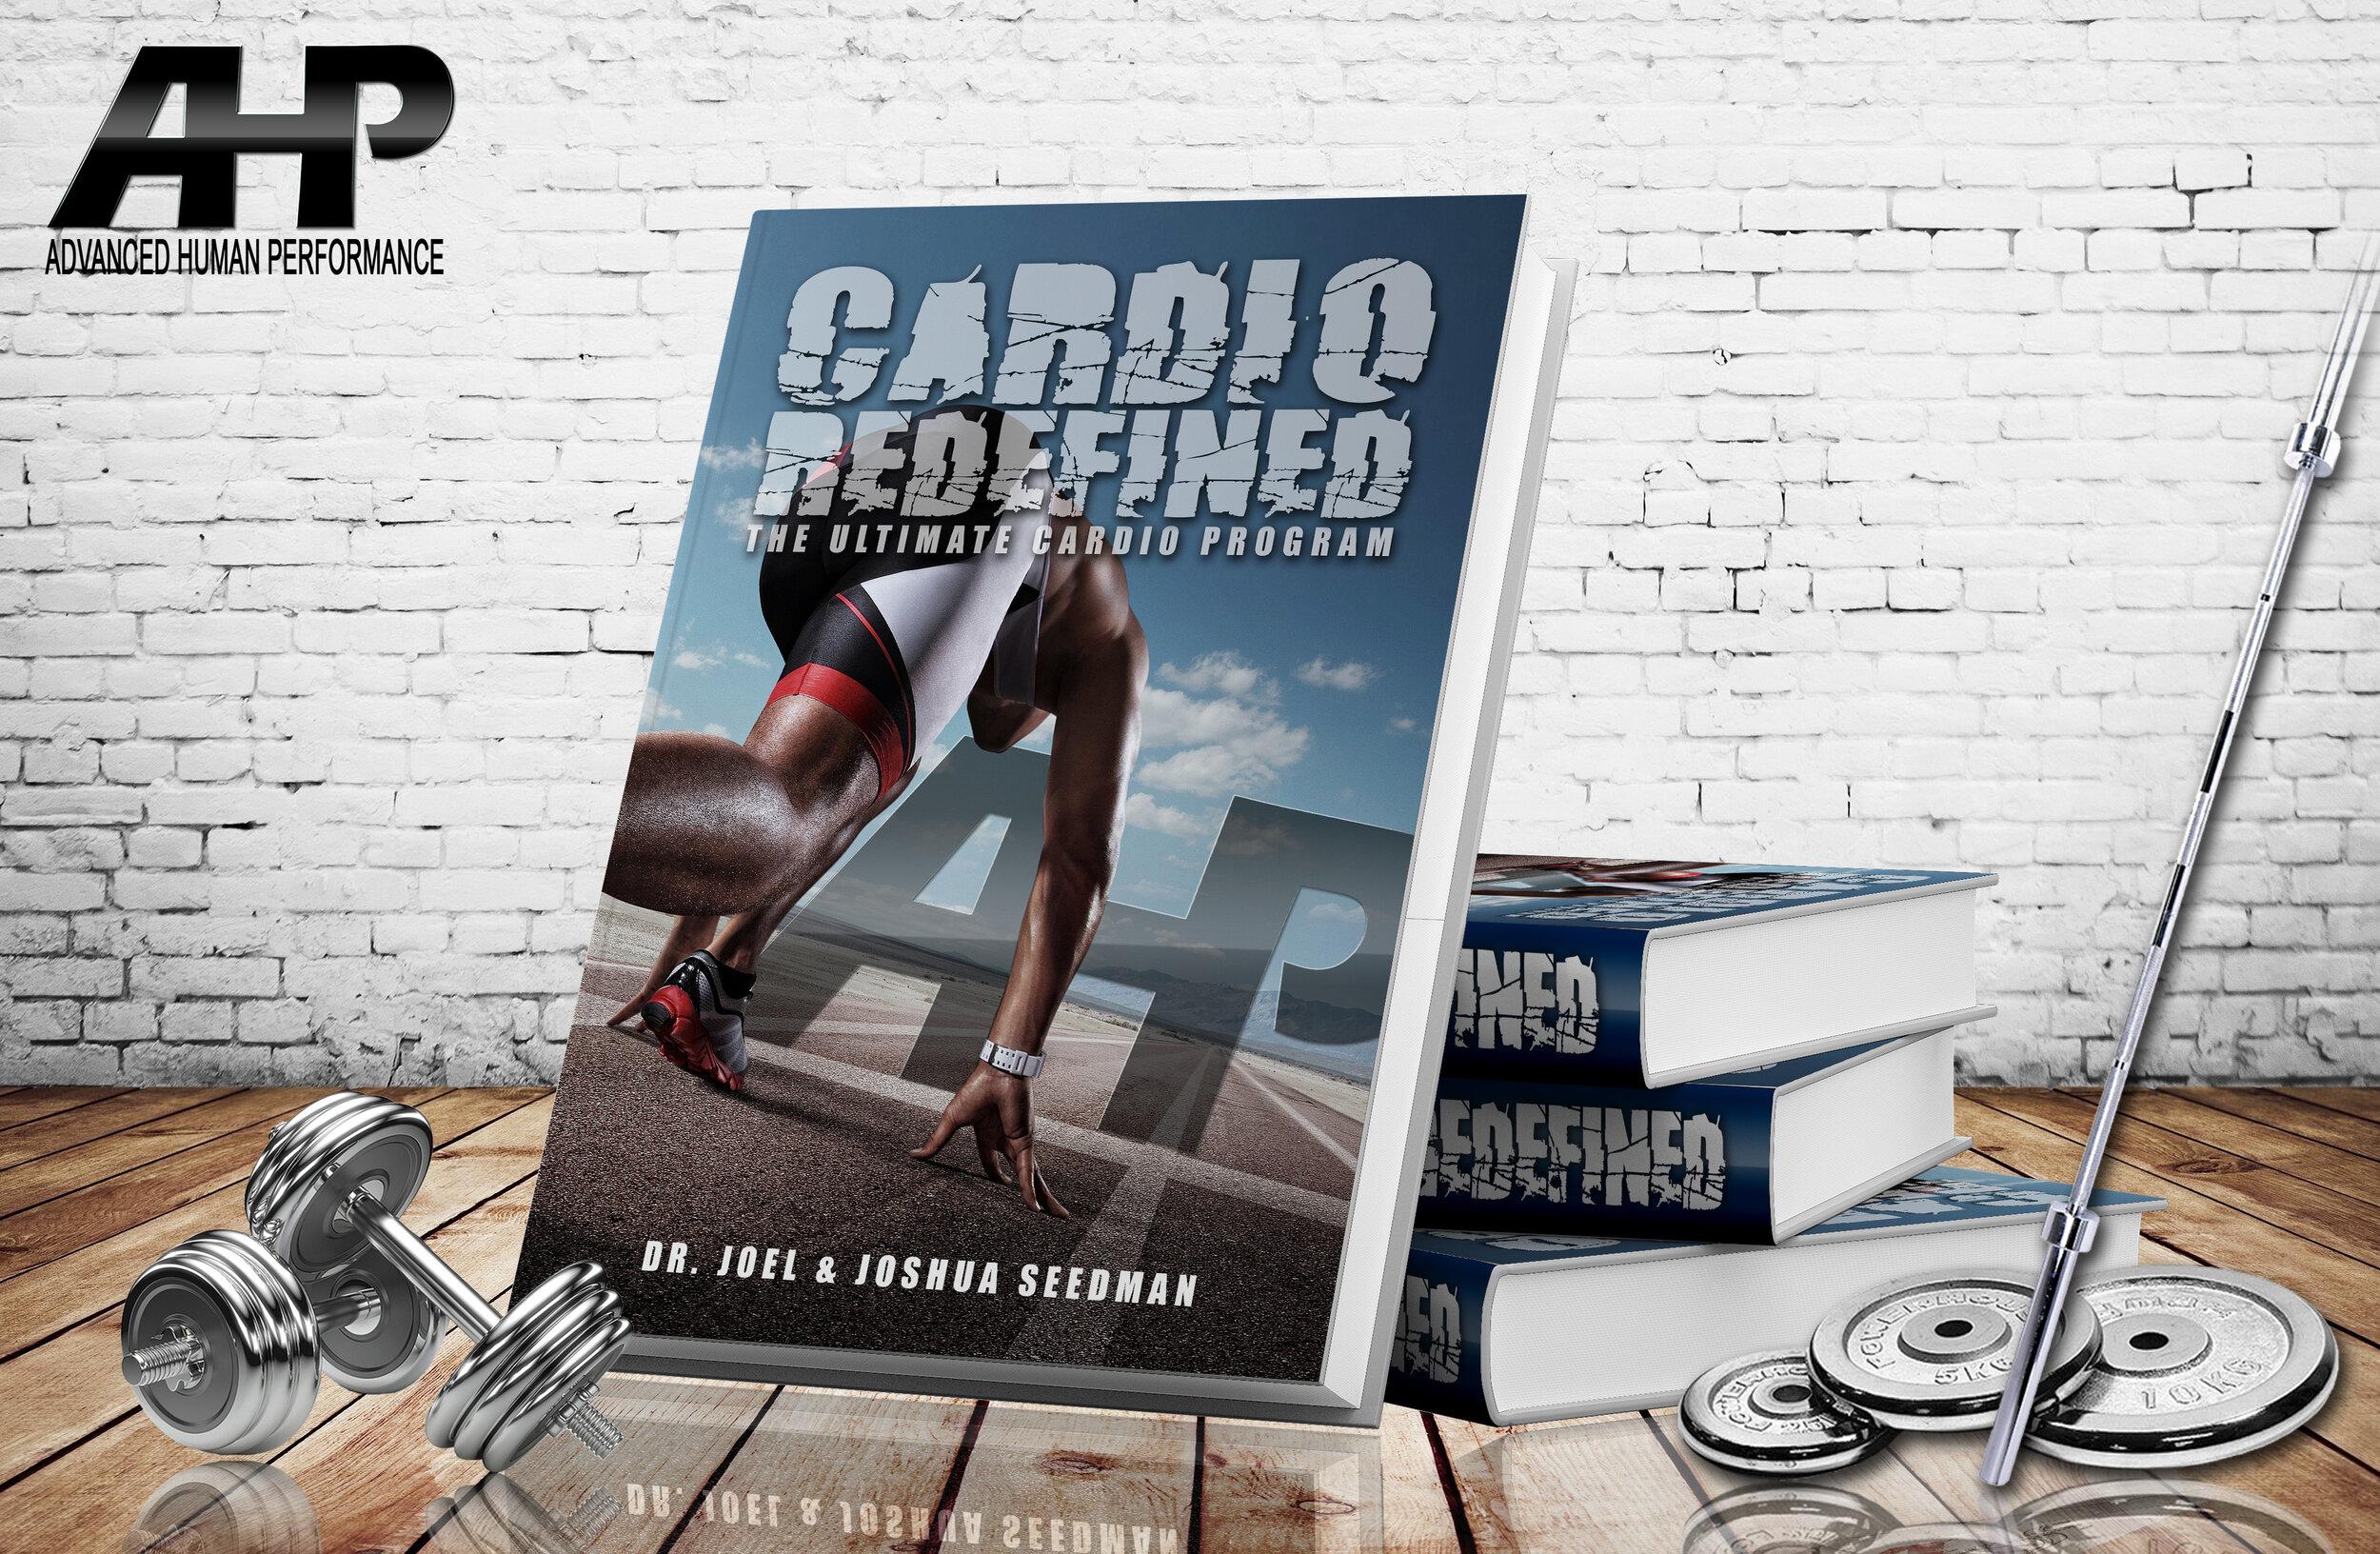 Cardio Redefined Thumbnail (AHP).jpg